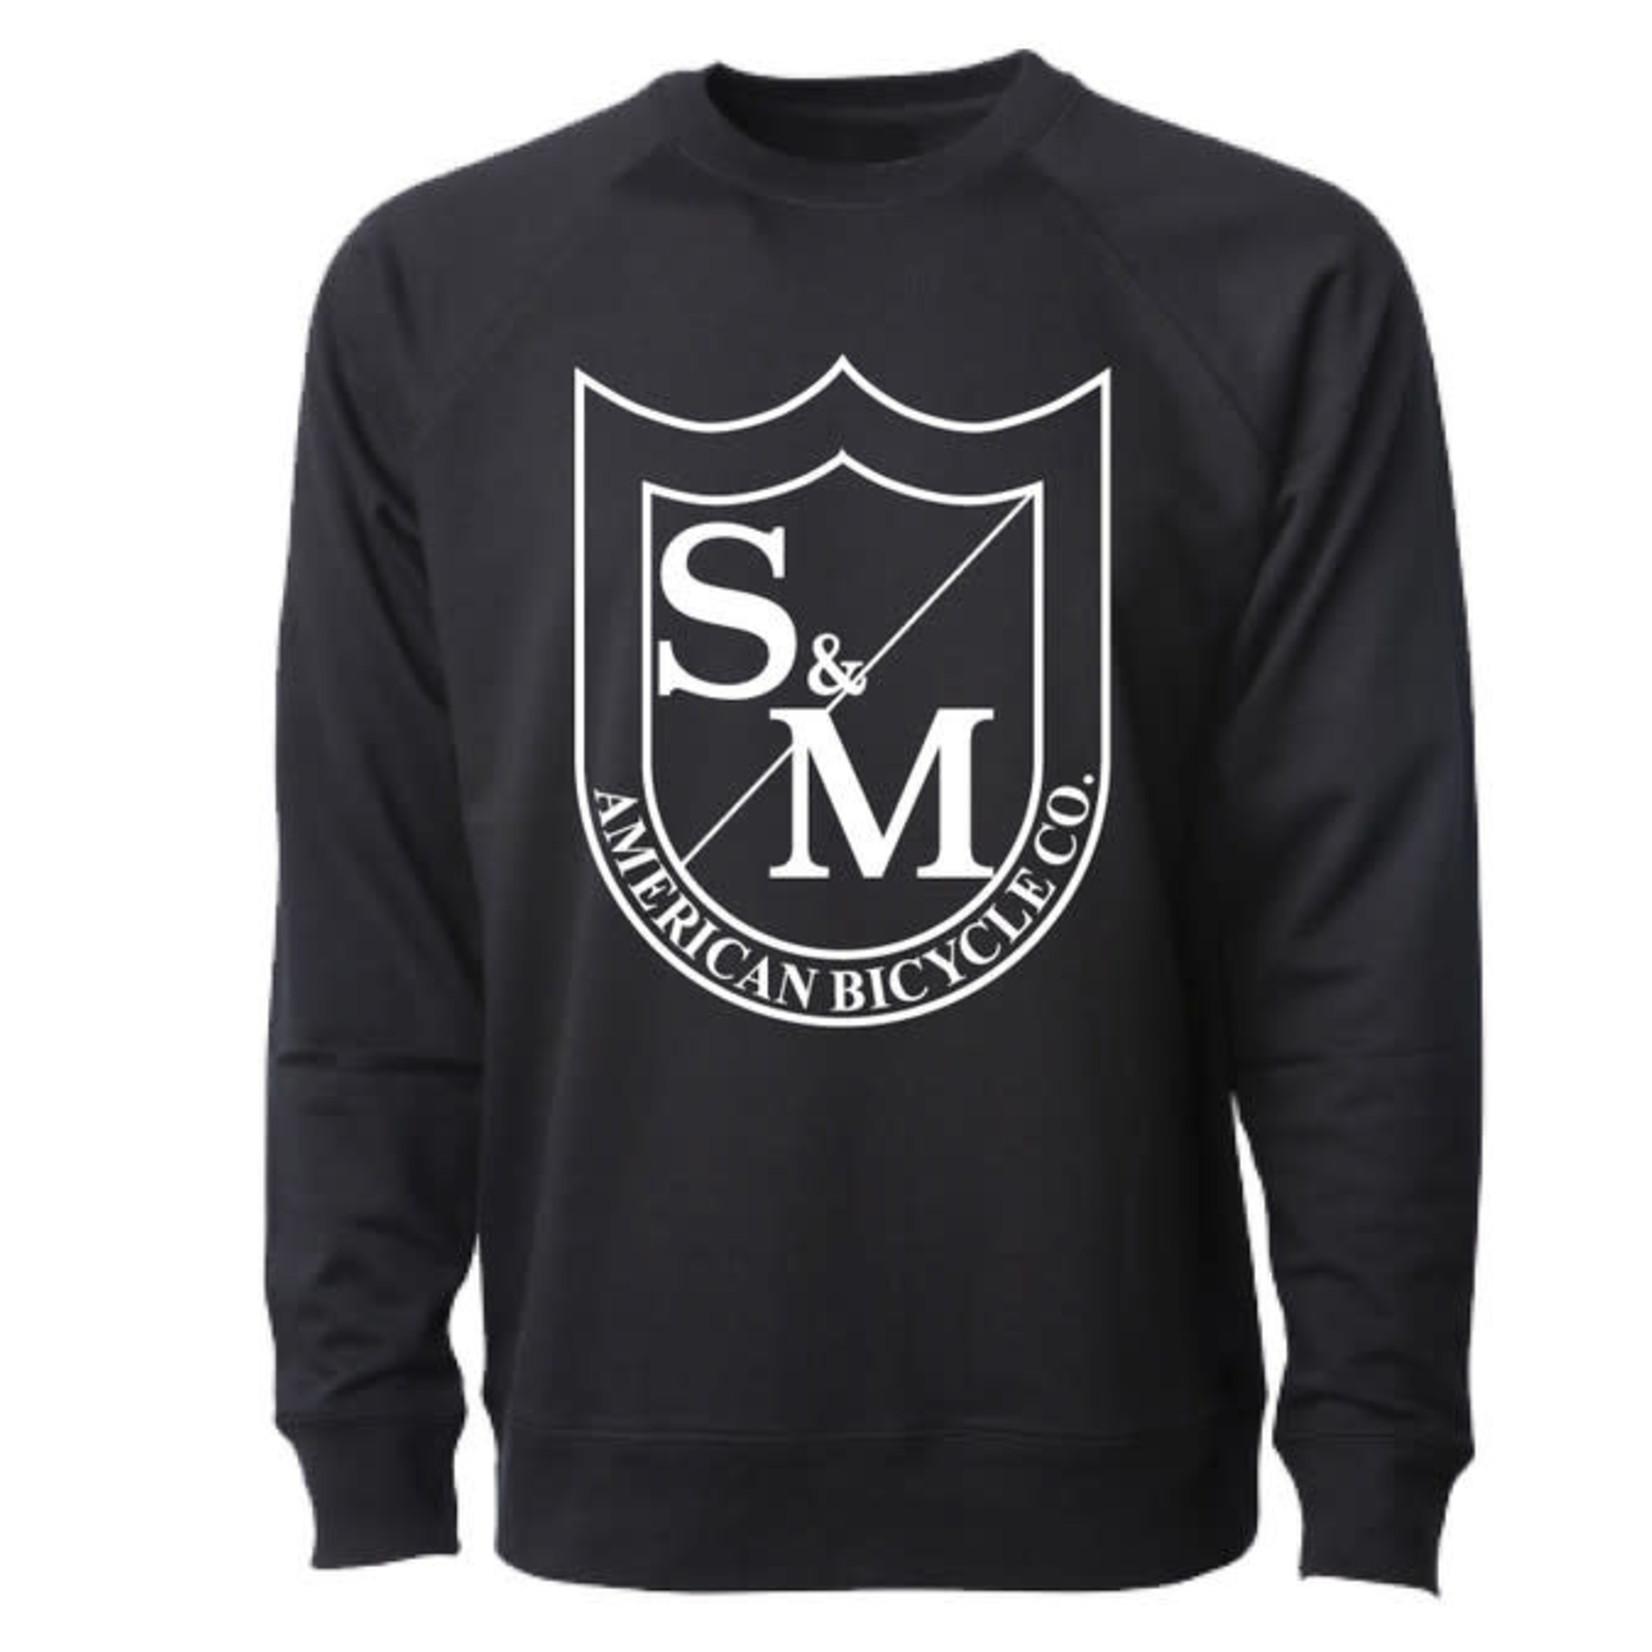 S&M BIG SHIELD CREW NECK SWEATSHIRT - BLACK